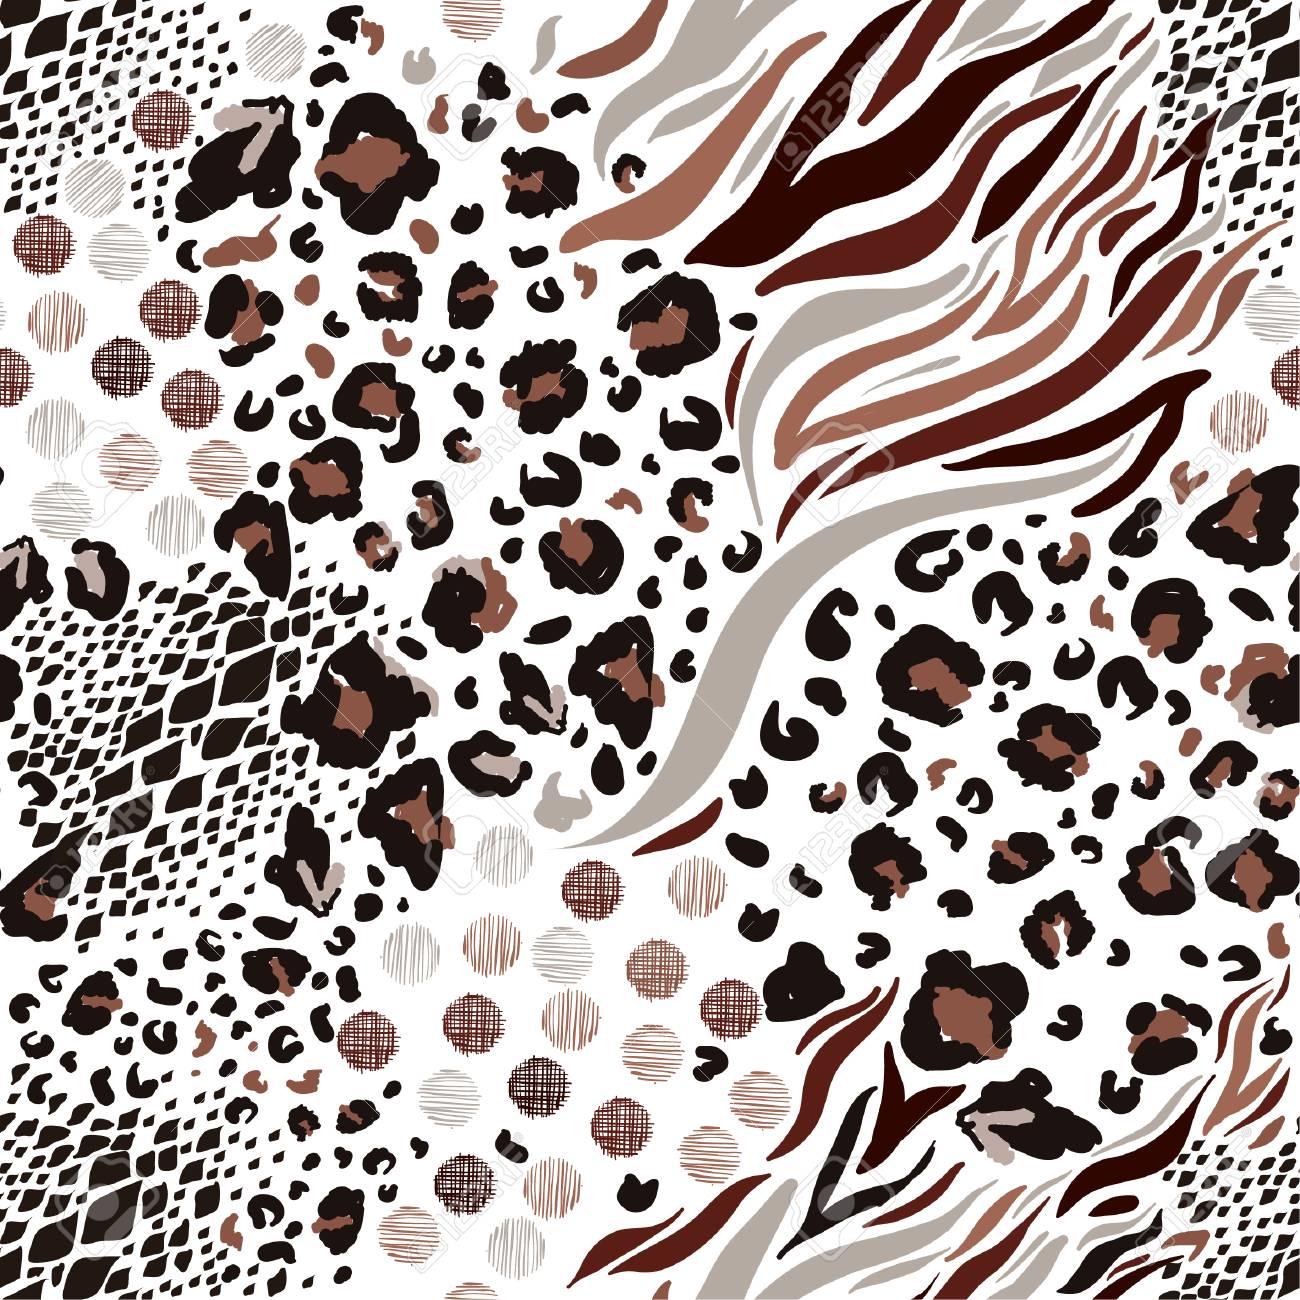 67b607a9d4a2 Mix animal skin prints ,Leopard, snake, zebra, tiger safari africa seamless  pattern